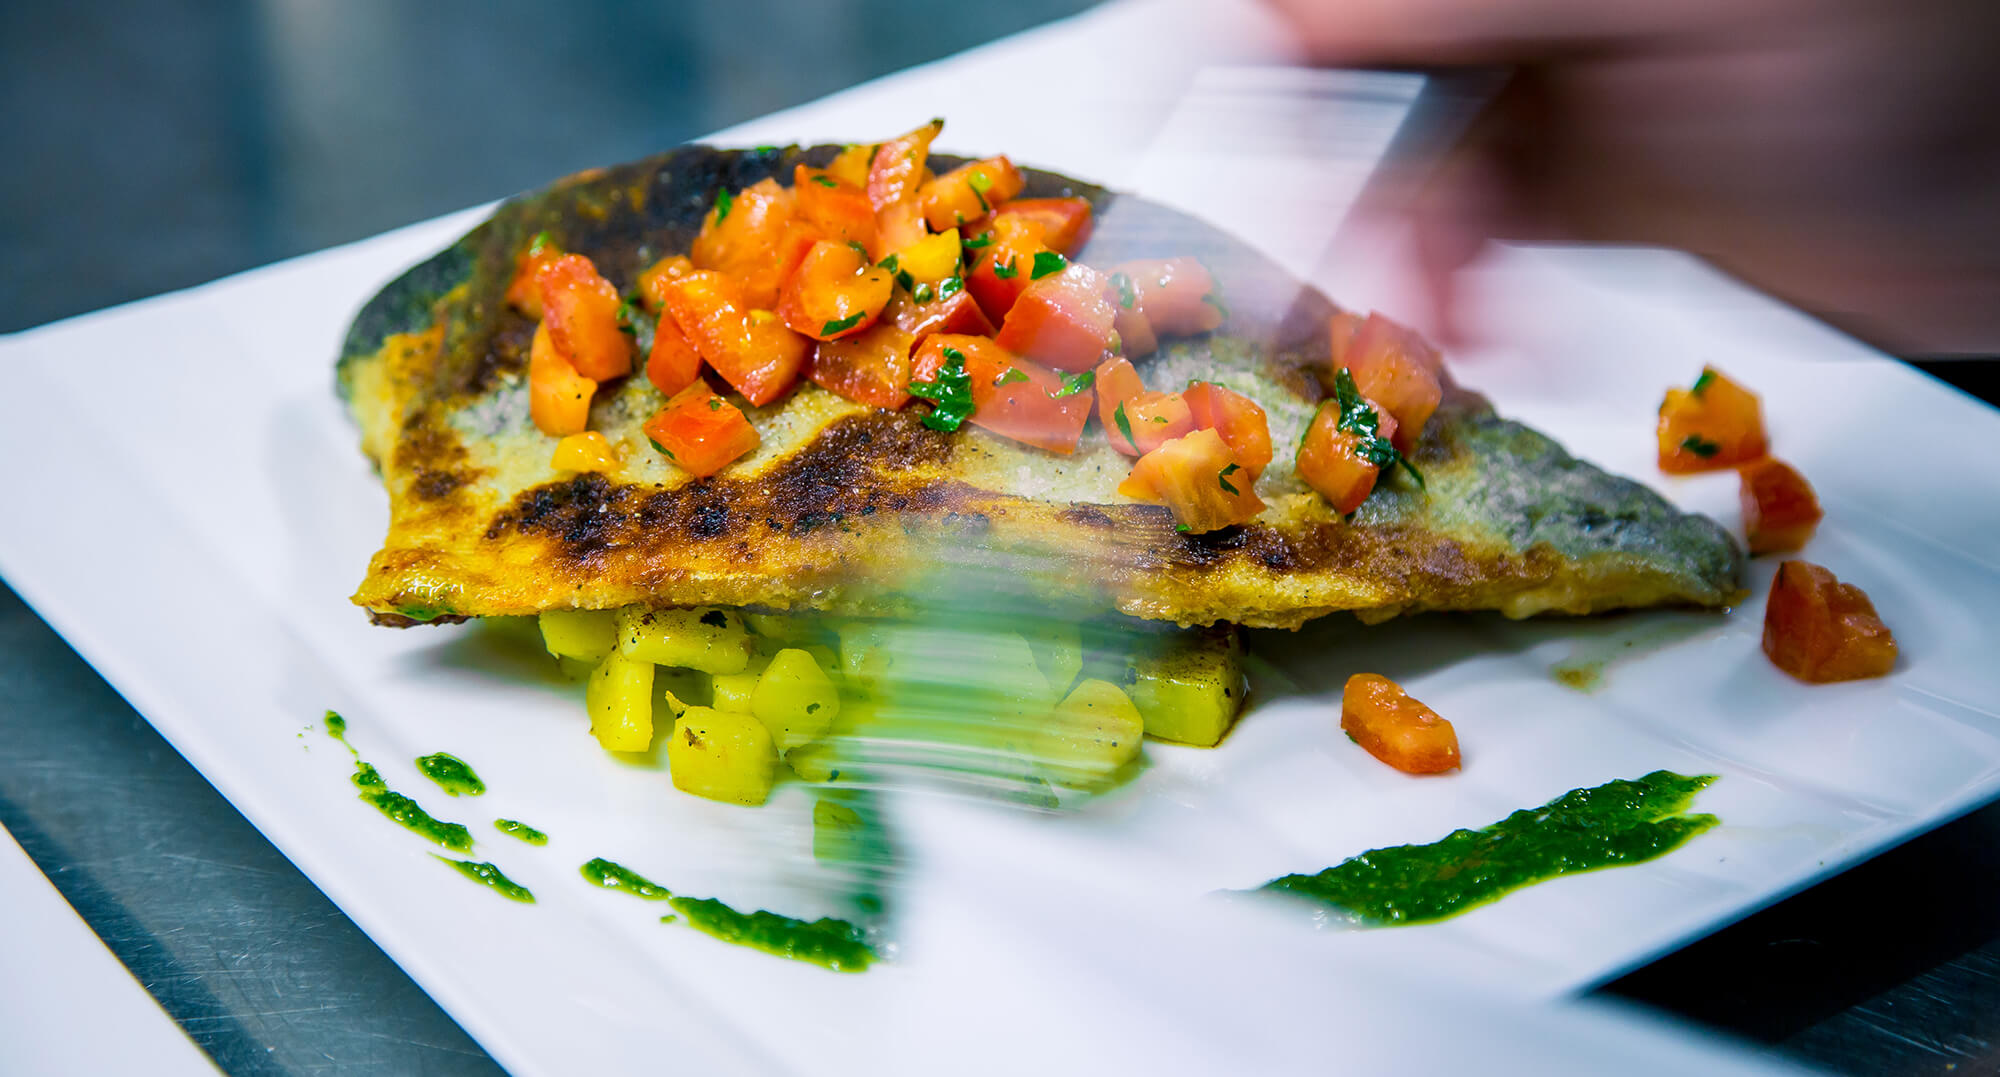 THALHAMMERs GRILL exquisiter Fisch